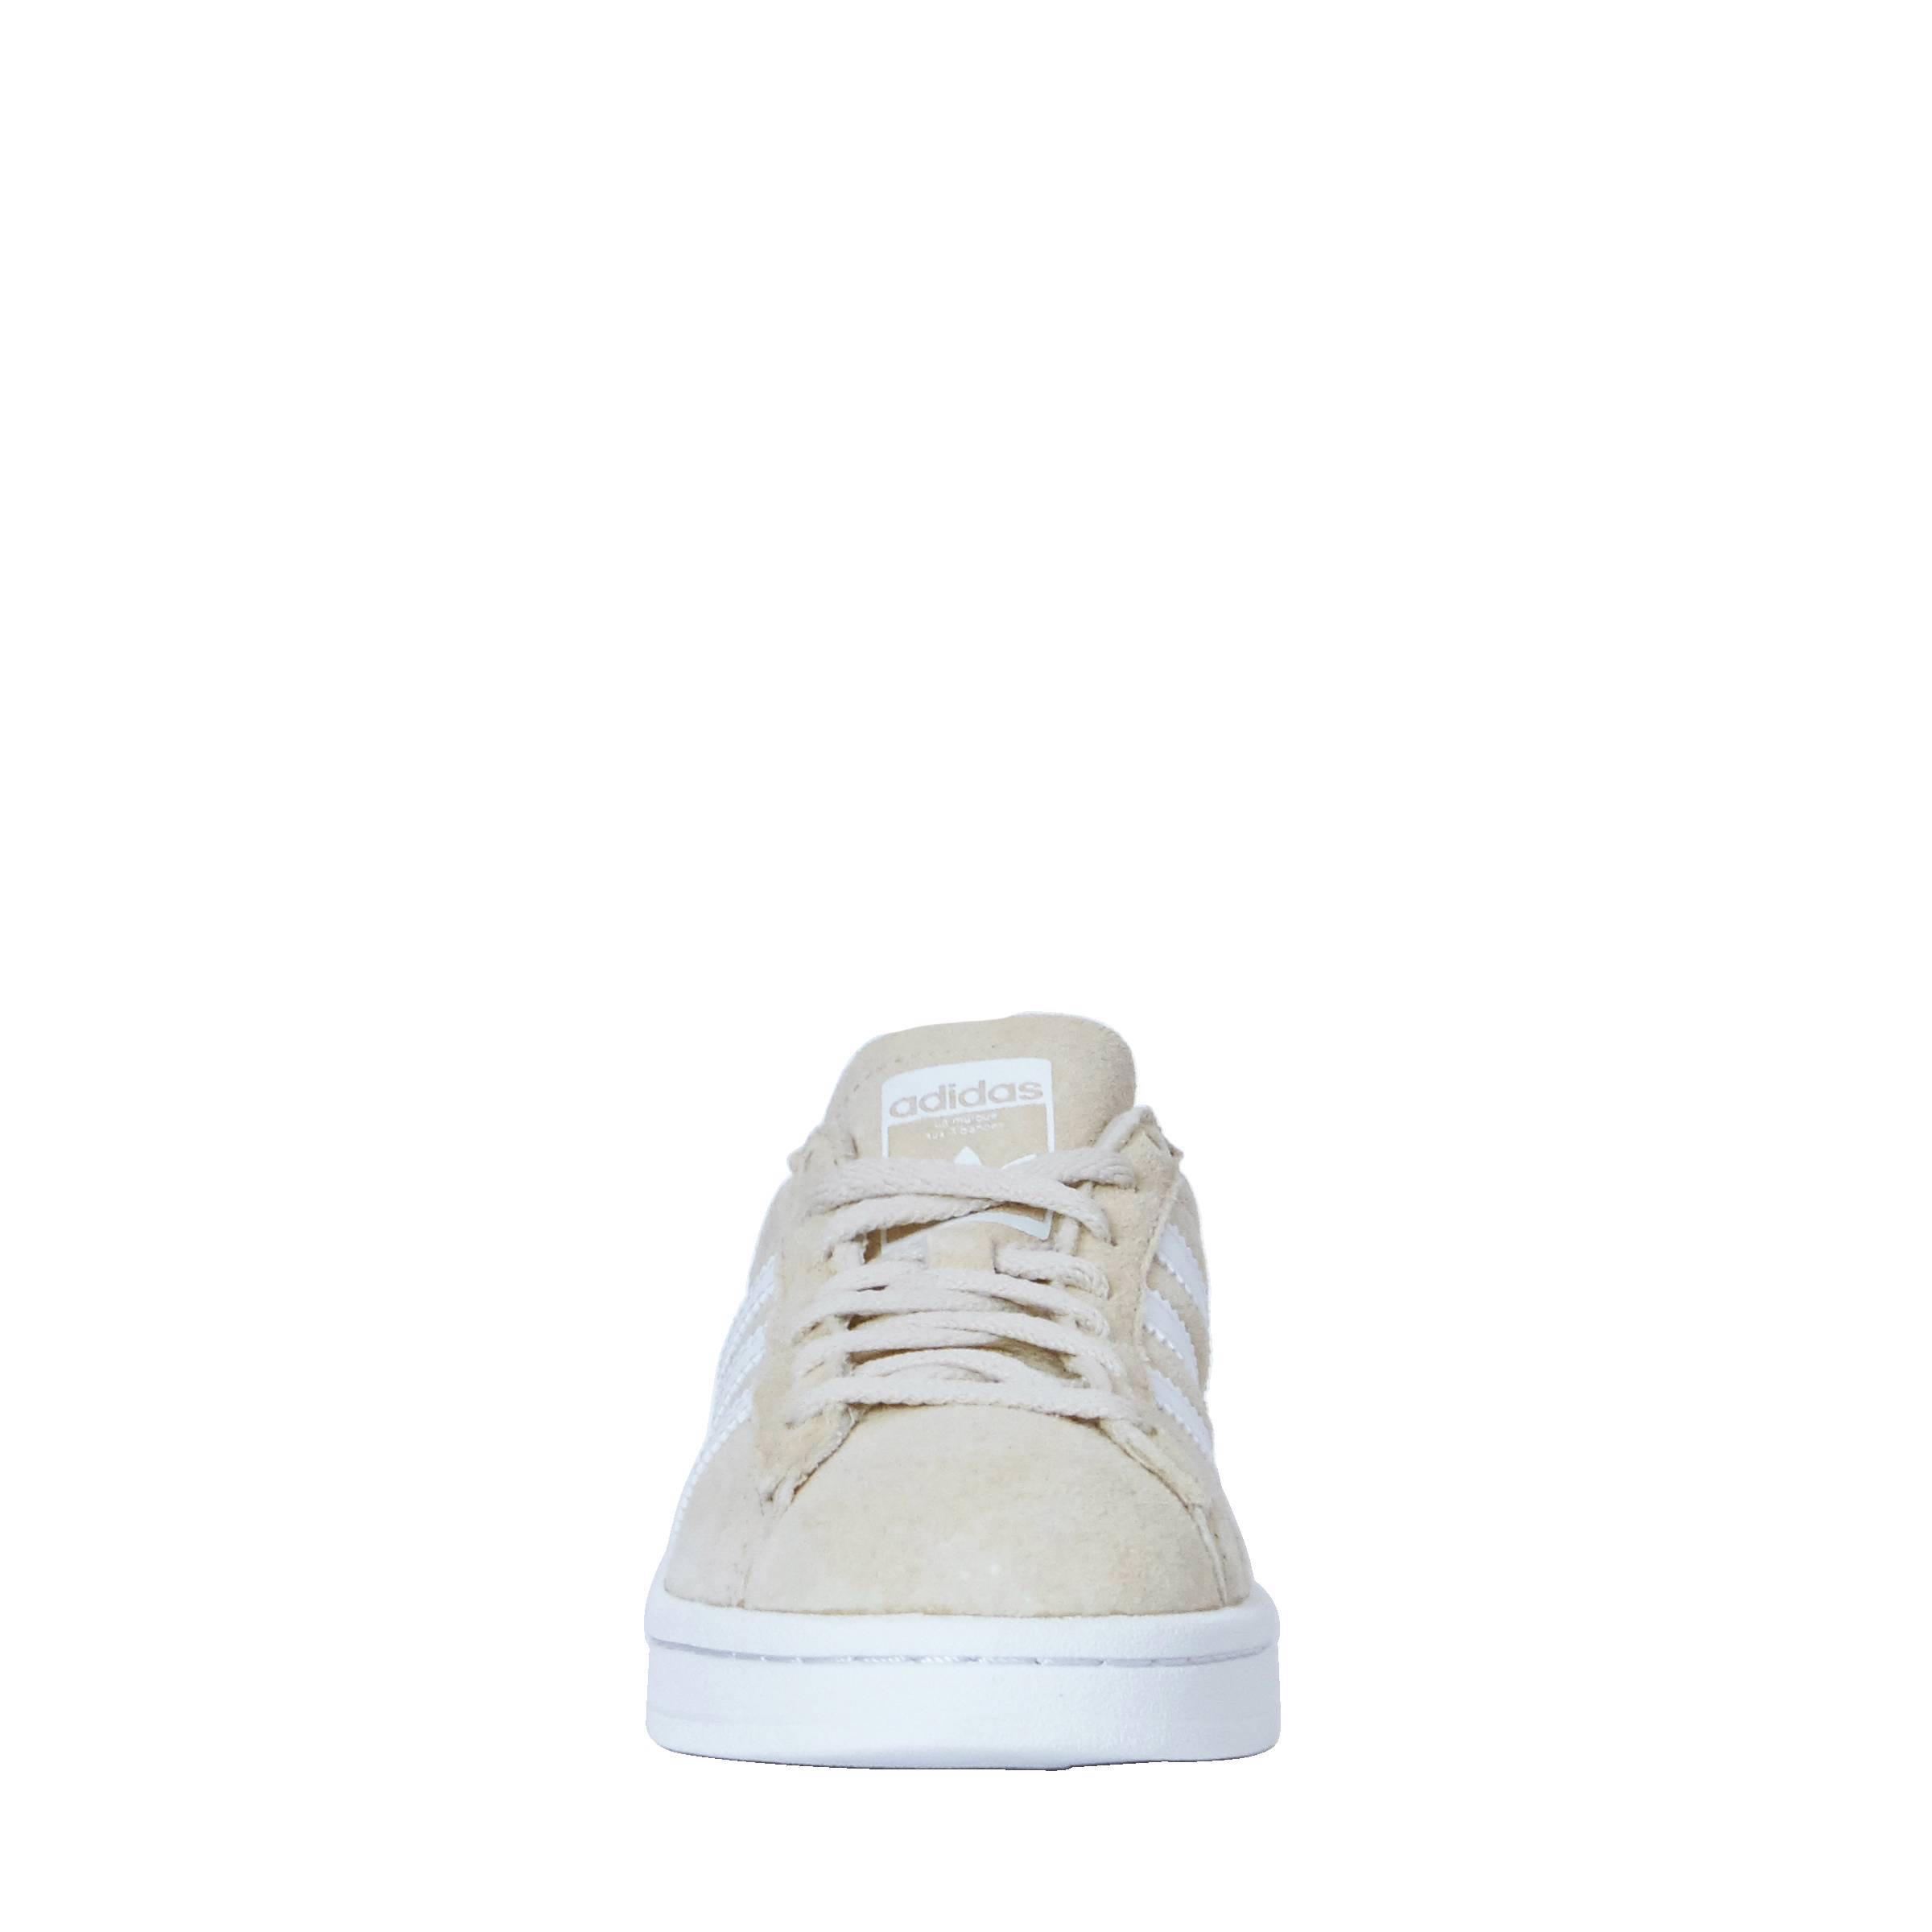 Dames adidas originals Campus W nubuck sneakers | wehkamp